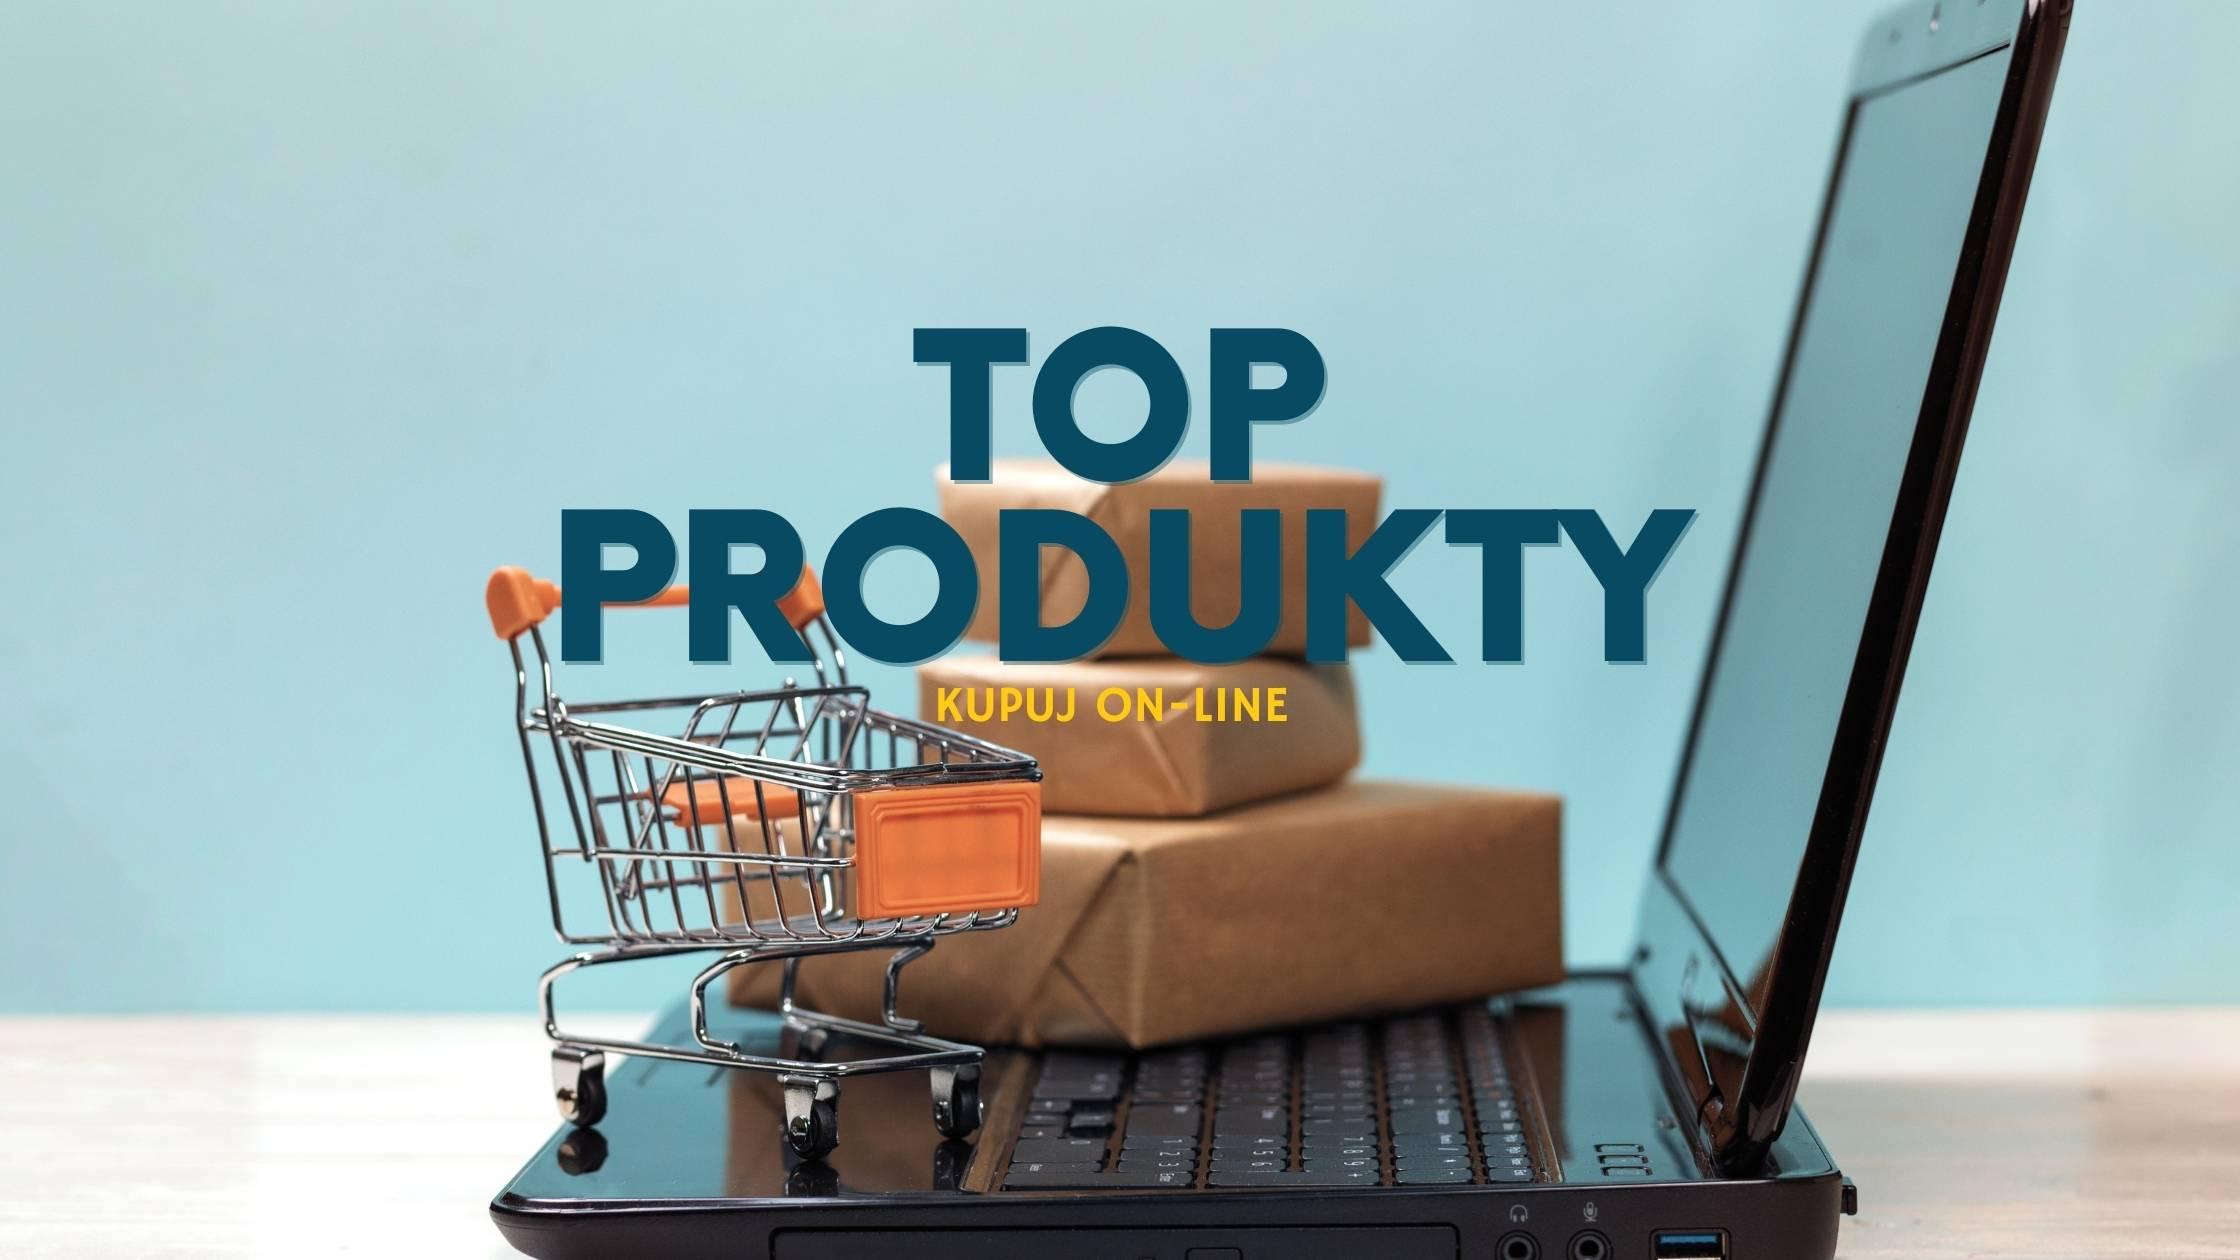 Top produkty - baner duzy